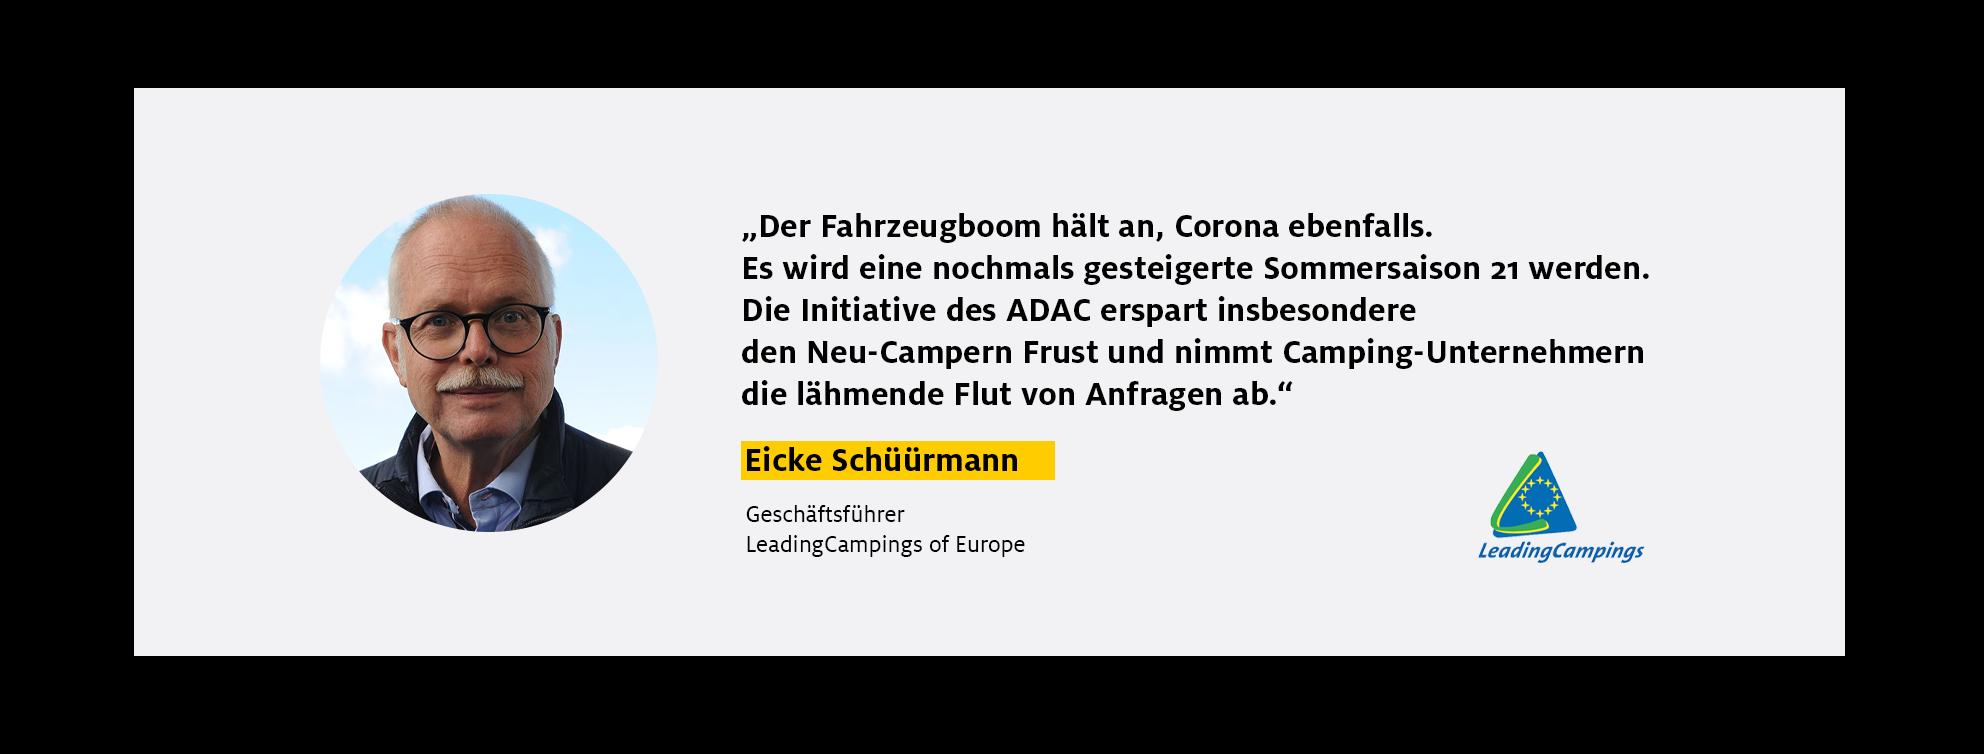 Grau Zitat Eicke Schüürmann 5